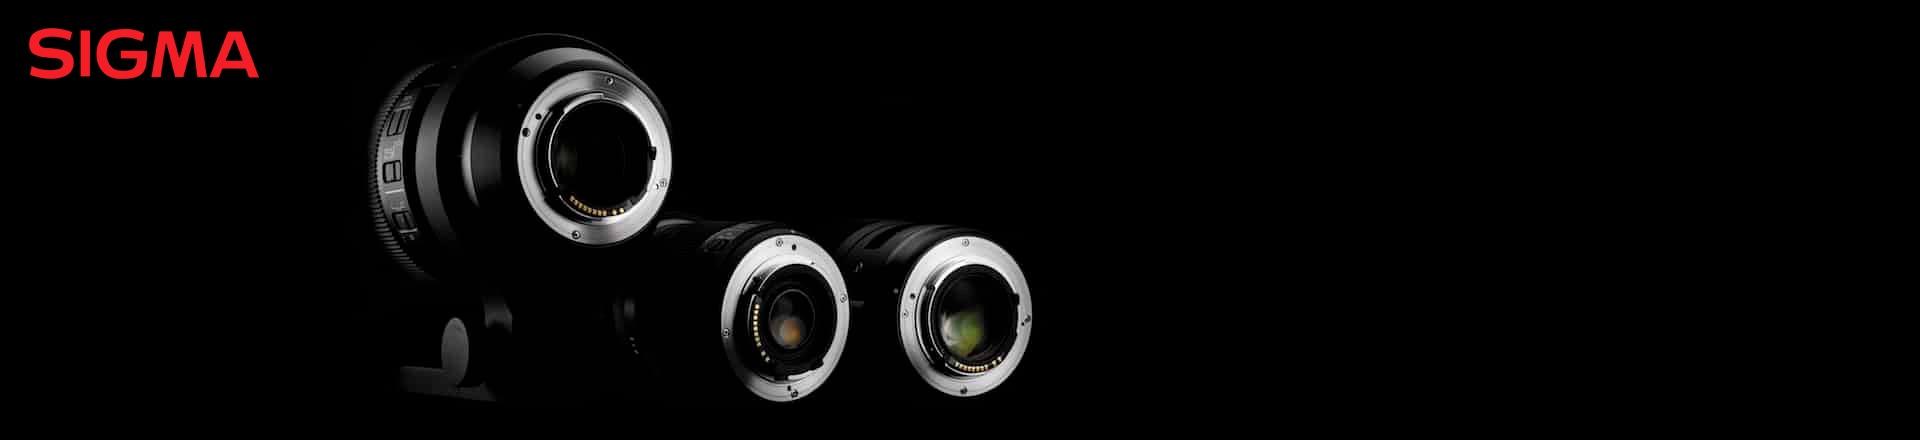 Objektiv-Systemkamera-Sigma-TitelbildGVJsQXHuj2PVG